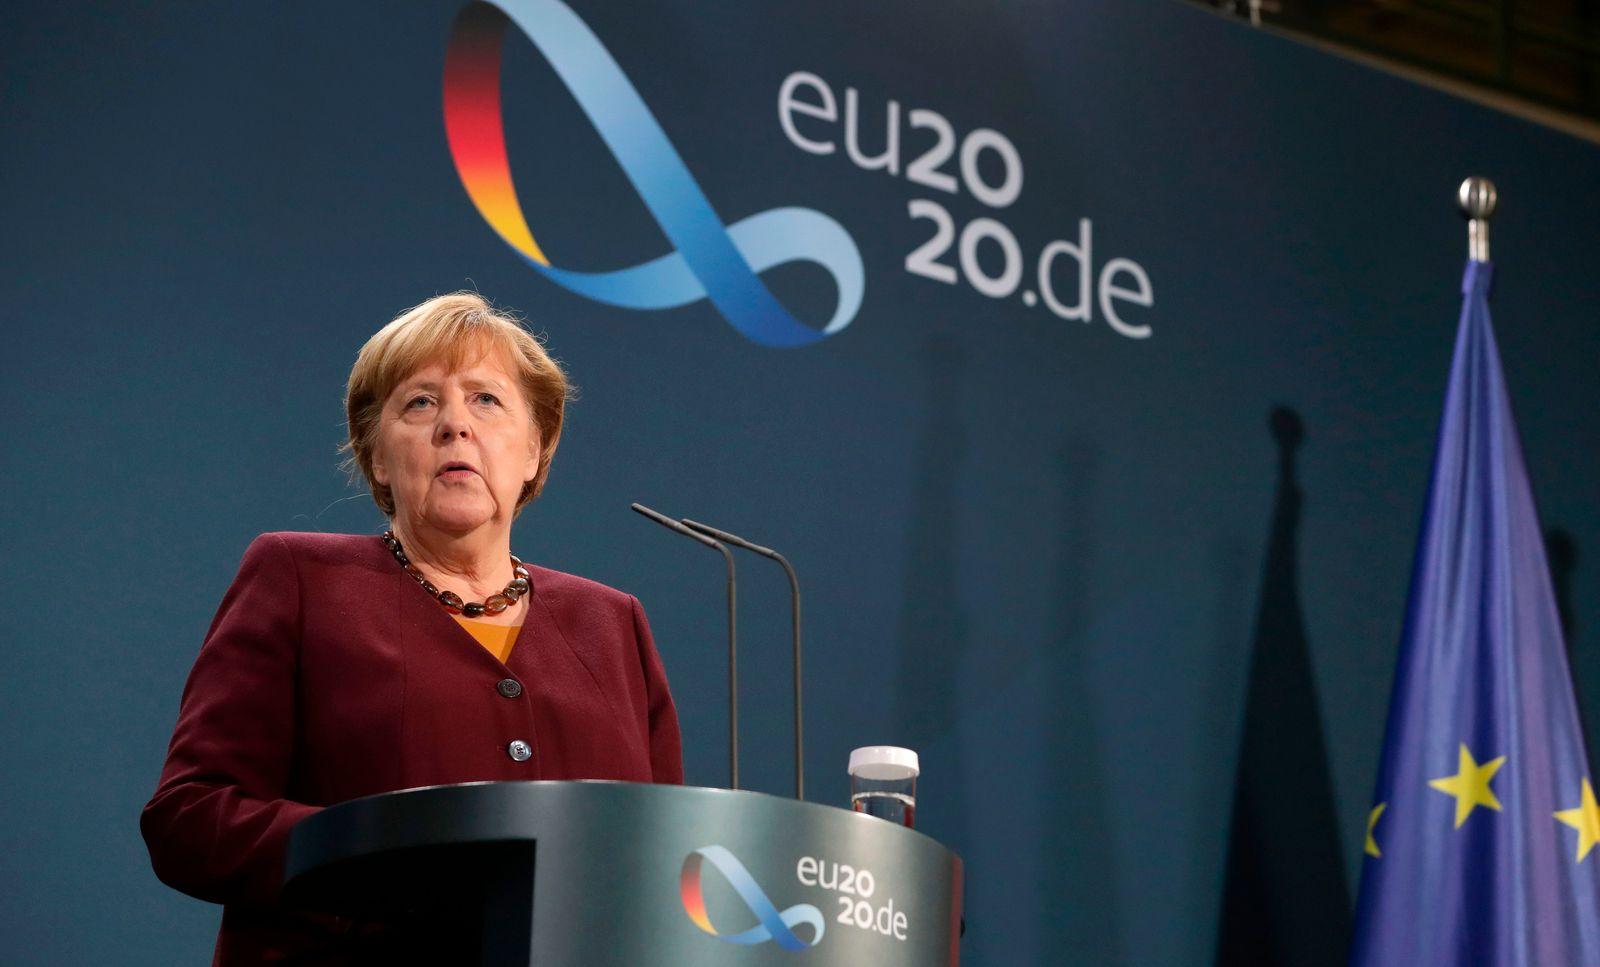 GERMANY-DIPLOMACY-GOVERNMENT-EU-PRESSER